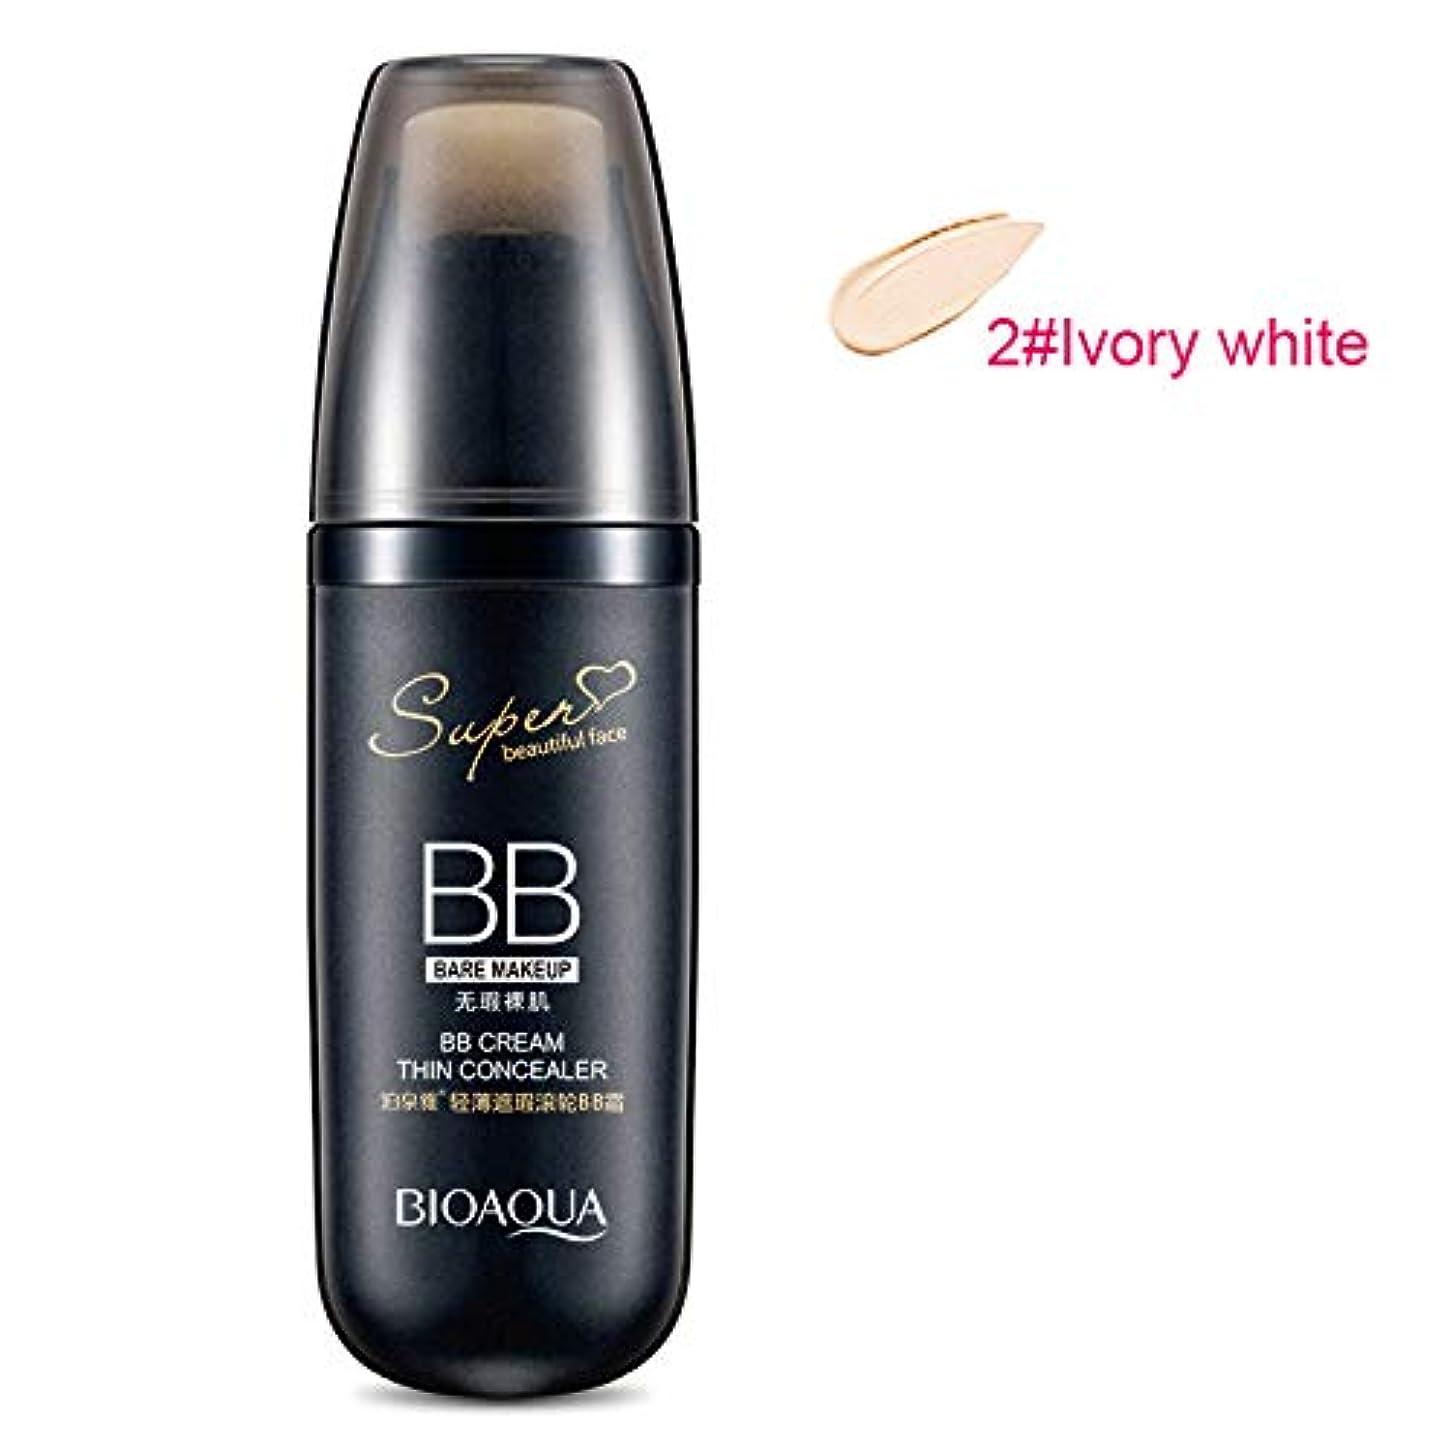 Symboat スクロール 液体 BBクリーム ファンデーション メイク コンシーラー 保湿 化粧品 フェイシャル ファンデーション 明るい肌色 自然な肌色 素肌感